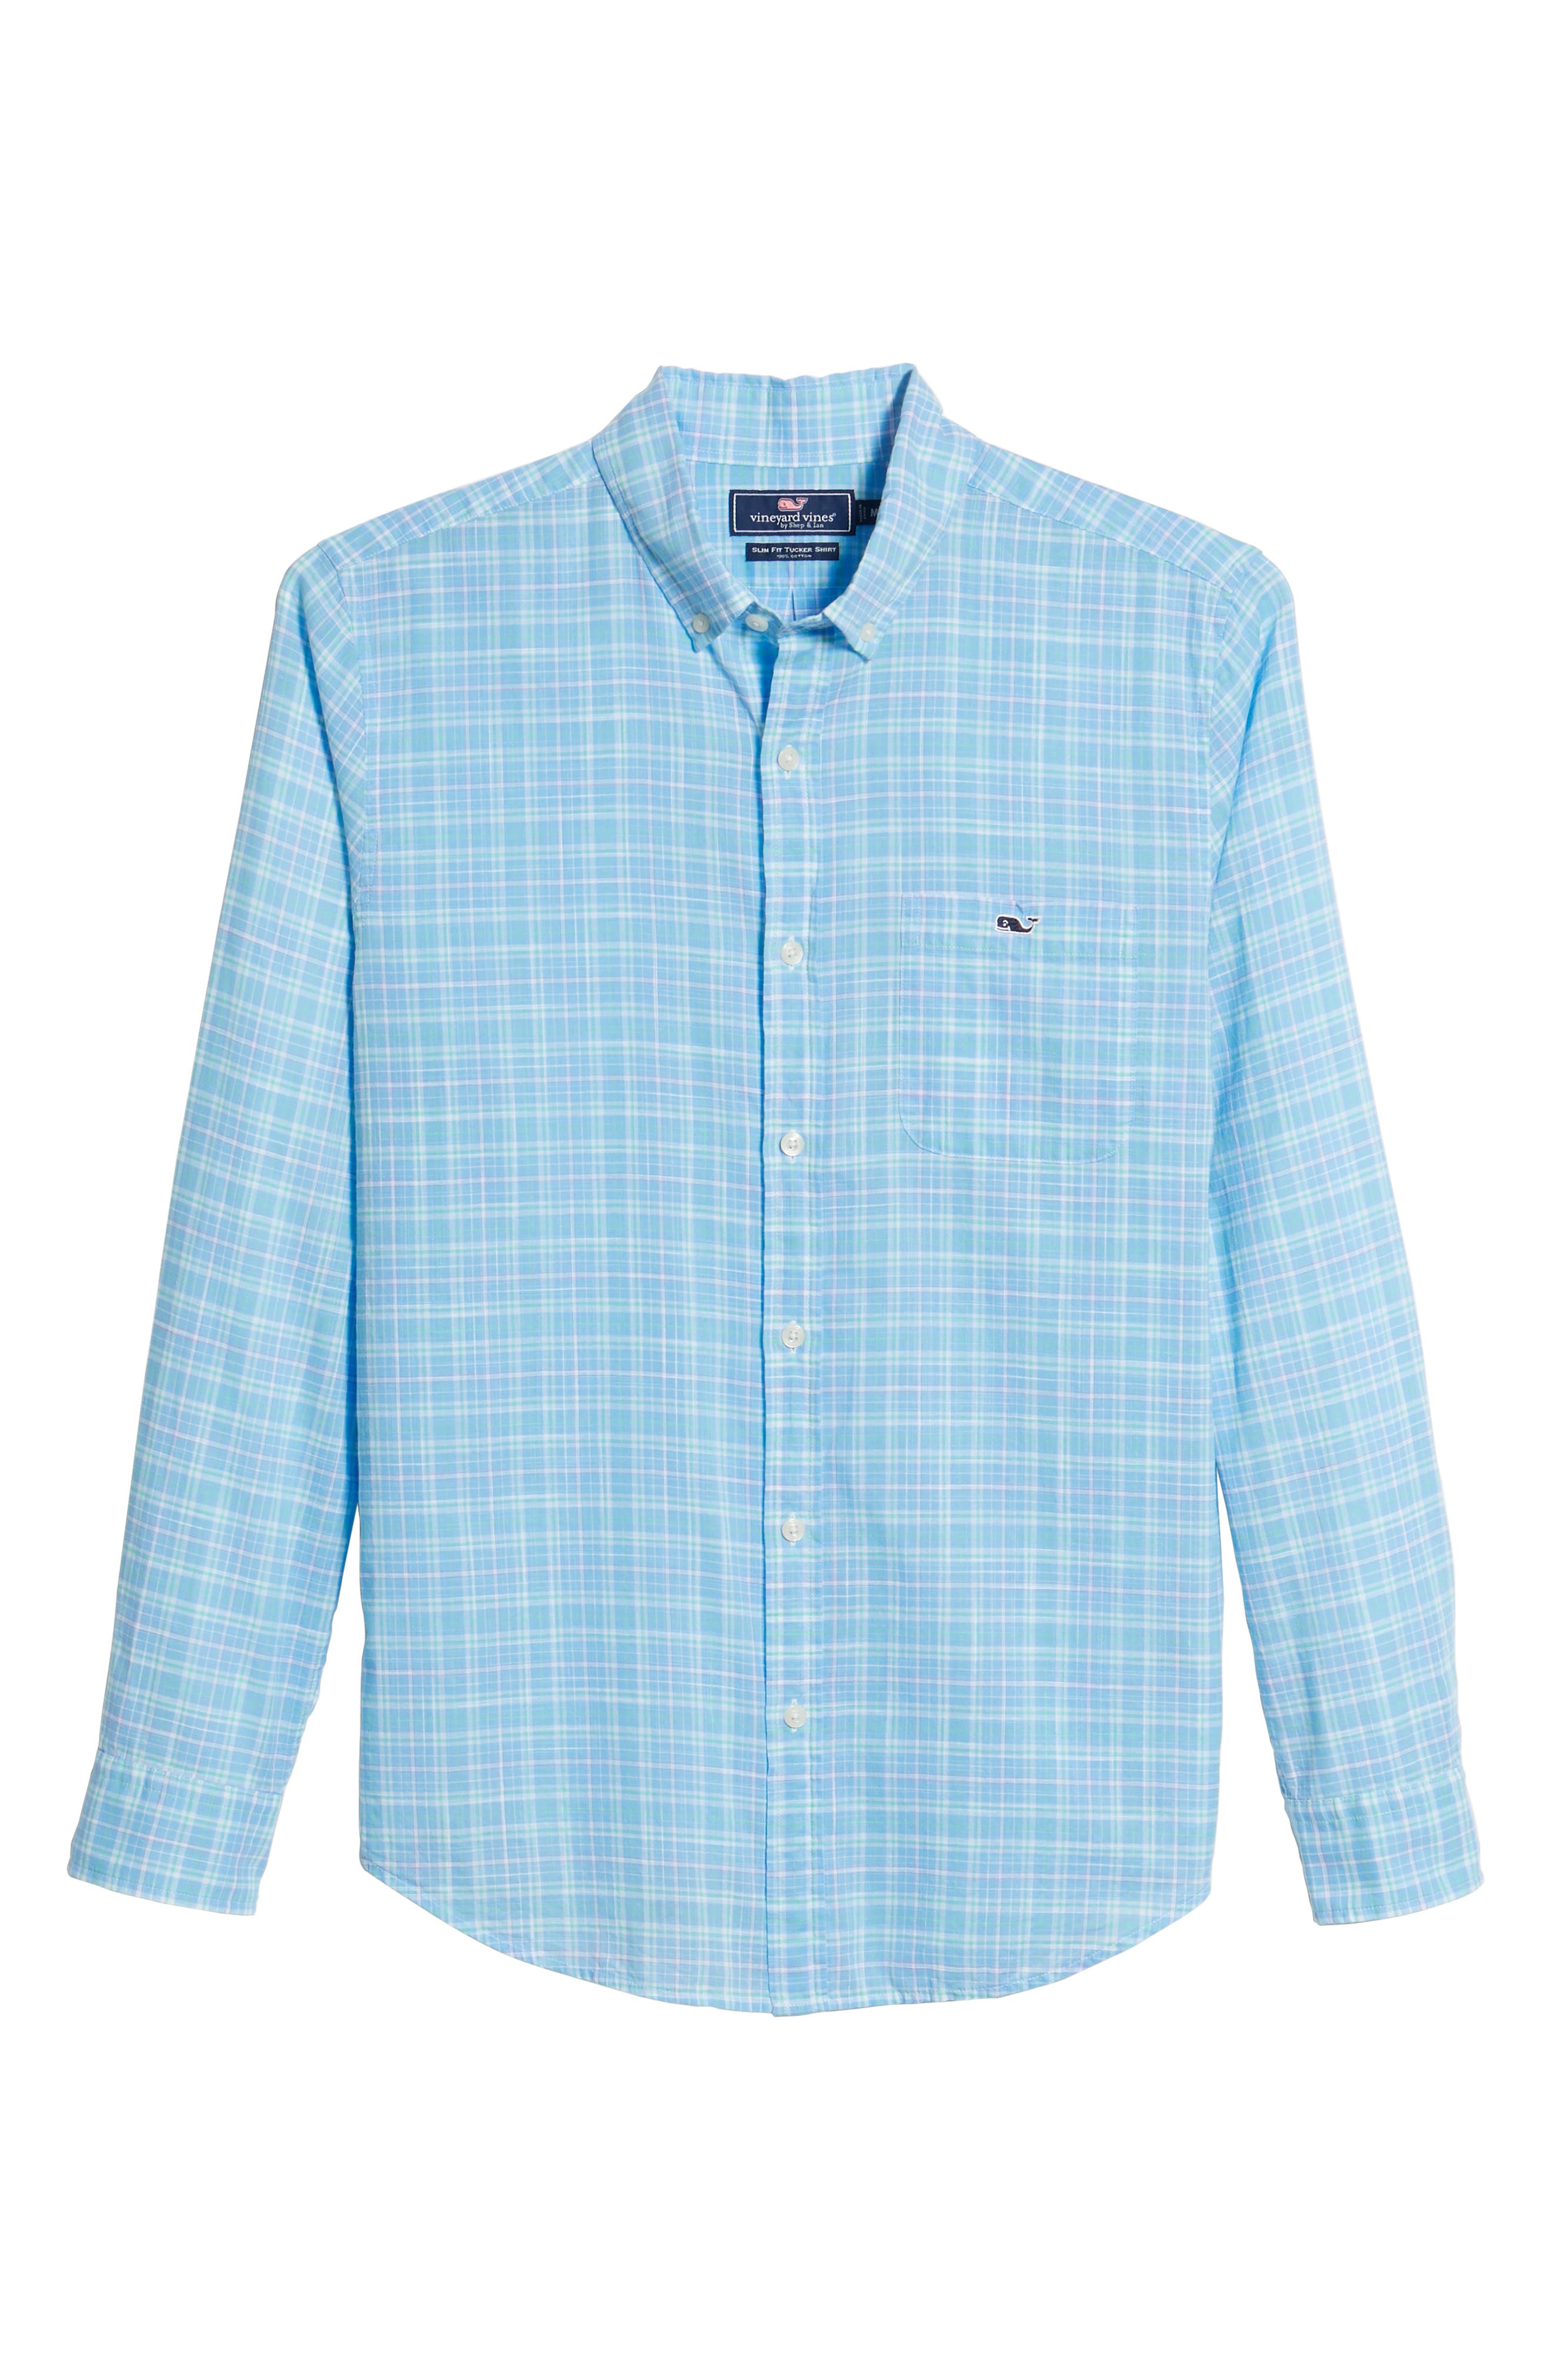 Stoney Hill Tucker Classic Fit Plaid Sport Shirt,                             Alternate thumbnail 16, color,